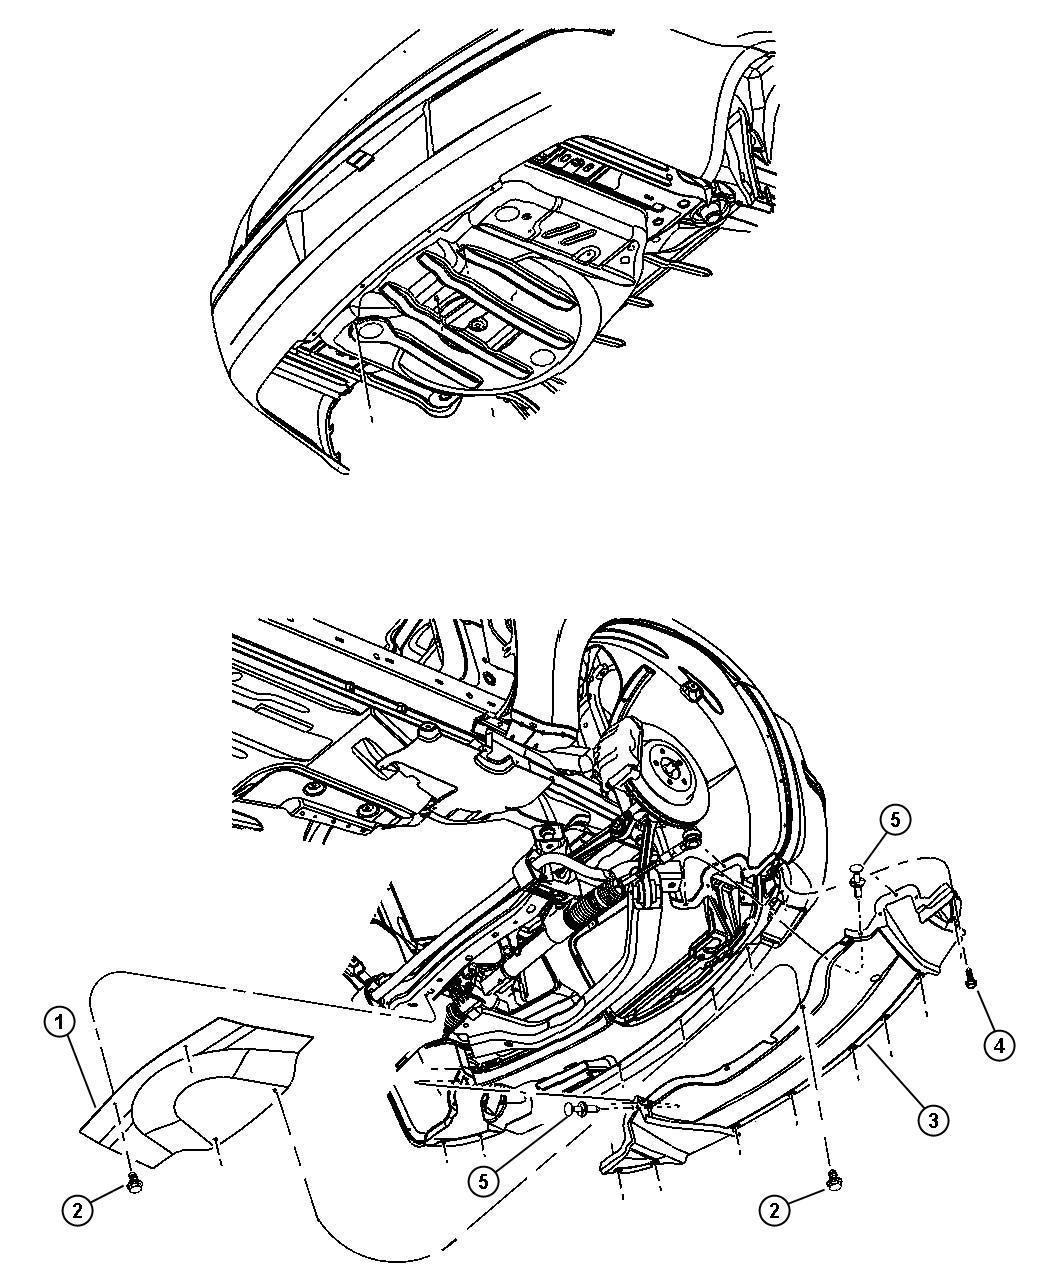 Dodge Challenger R T 5 7l Hemi V8 M T Belly Pan